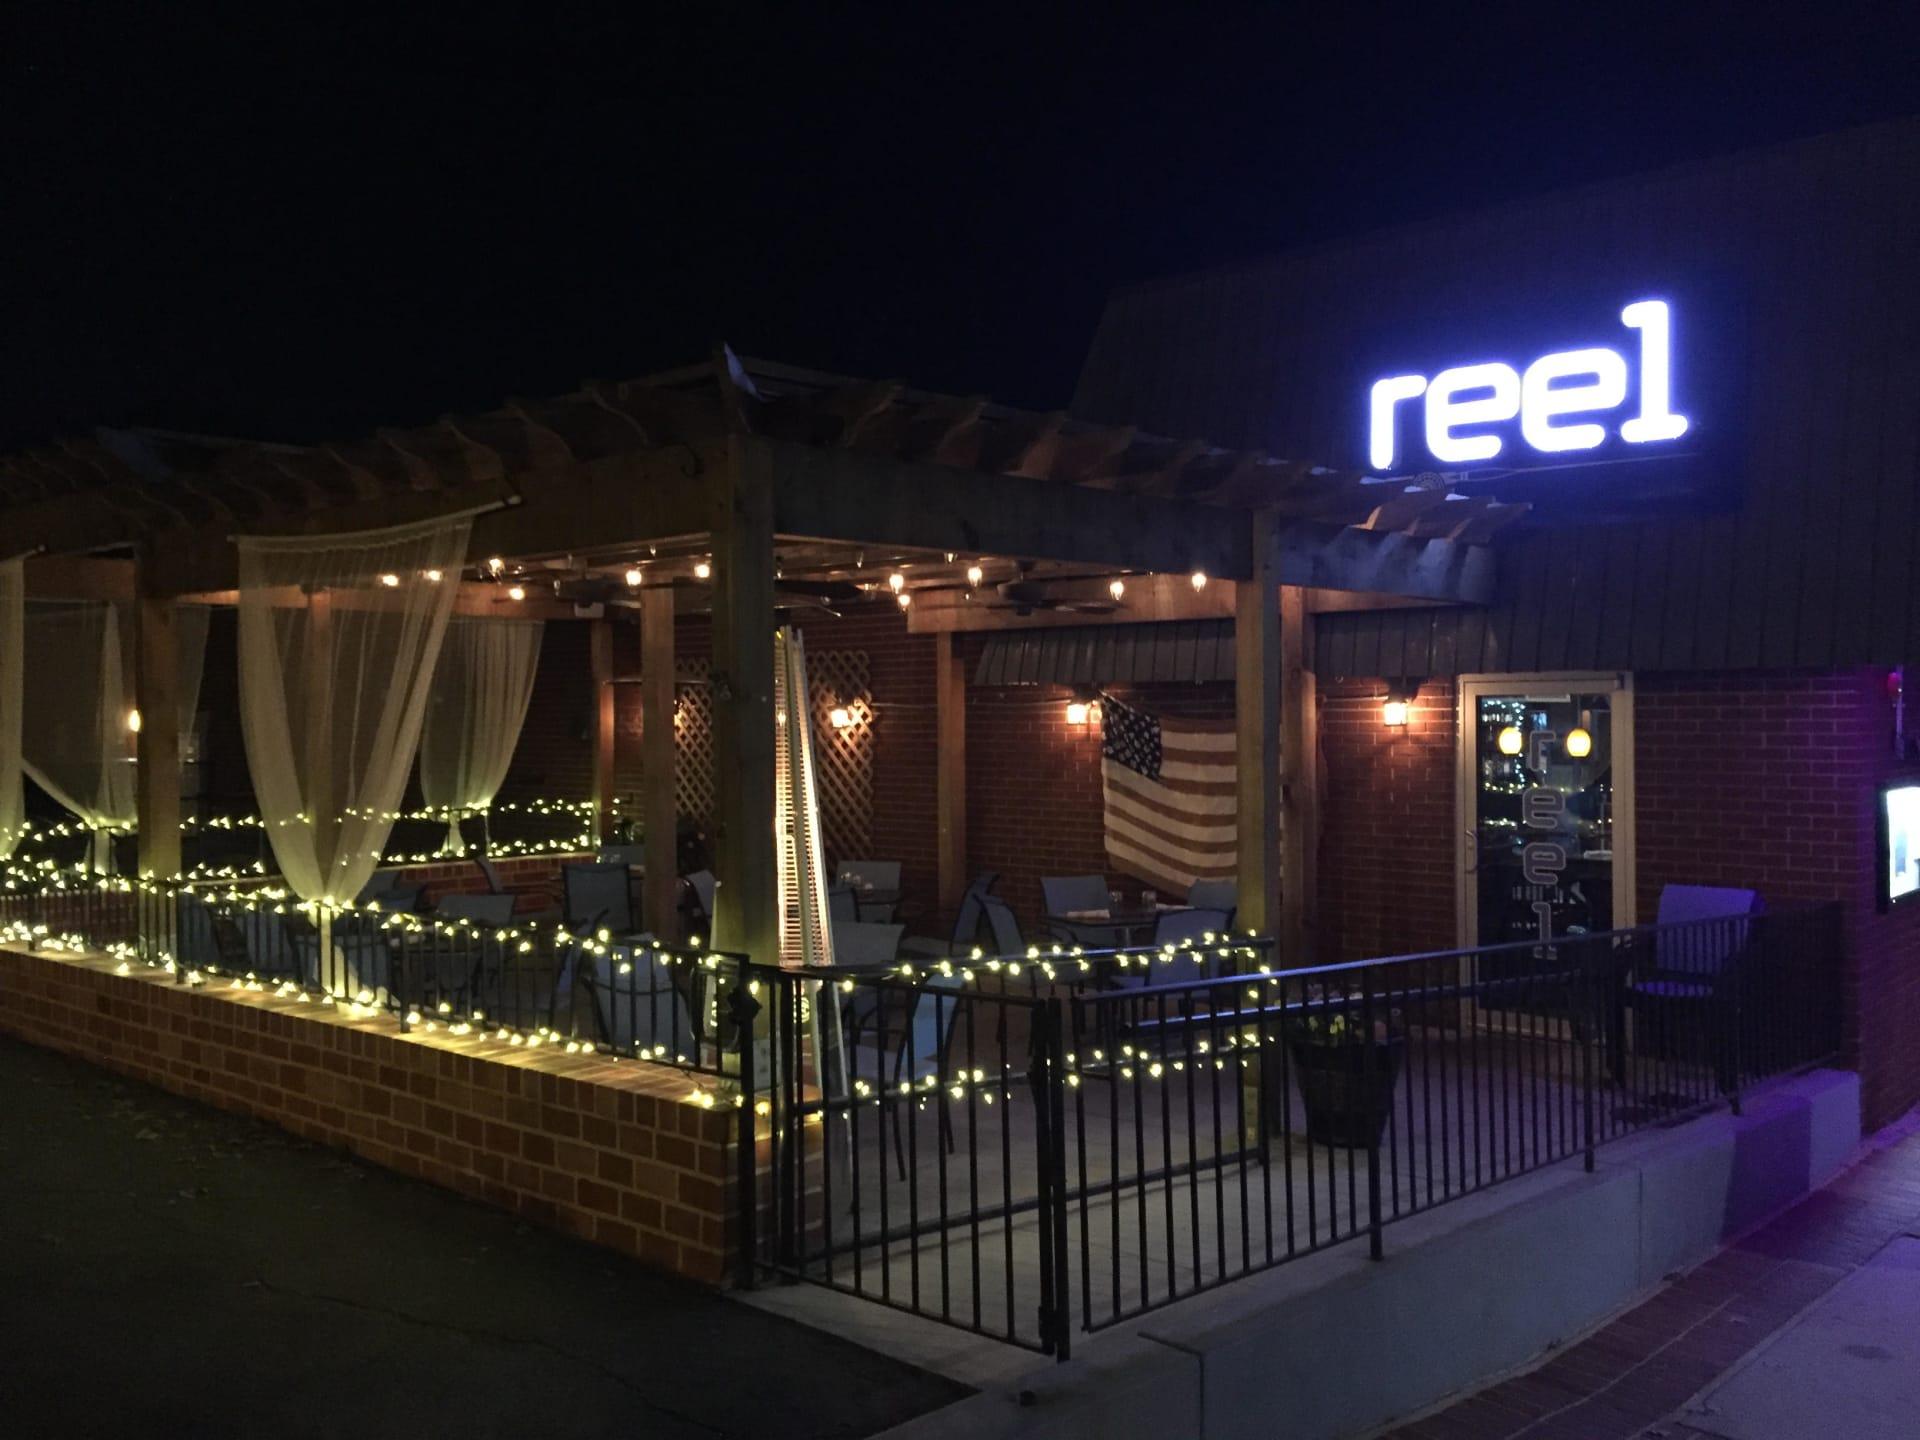 Reel Seafood Events